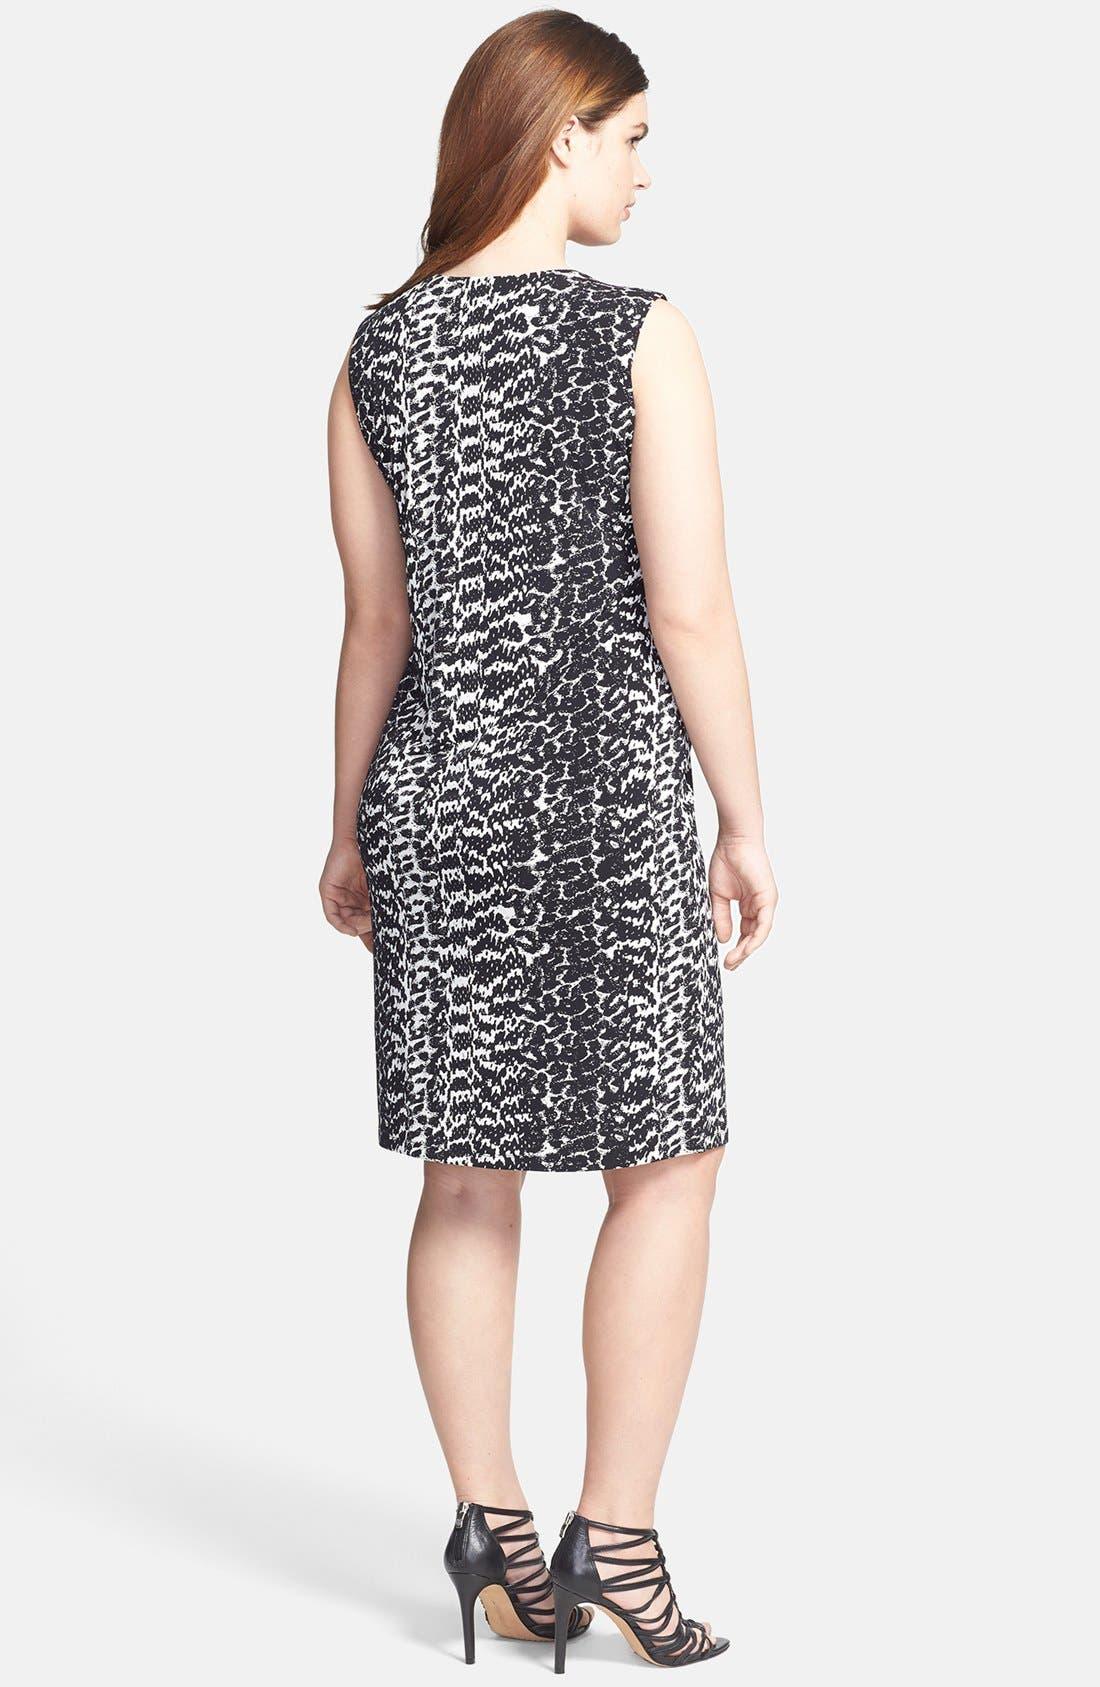 Alternate Image 2  - Vince Camuto 'Animal Tracks' Sleeveless Sheath Dress (Plus Size)